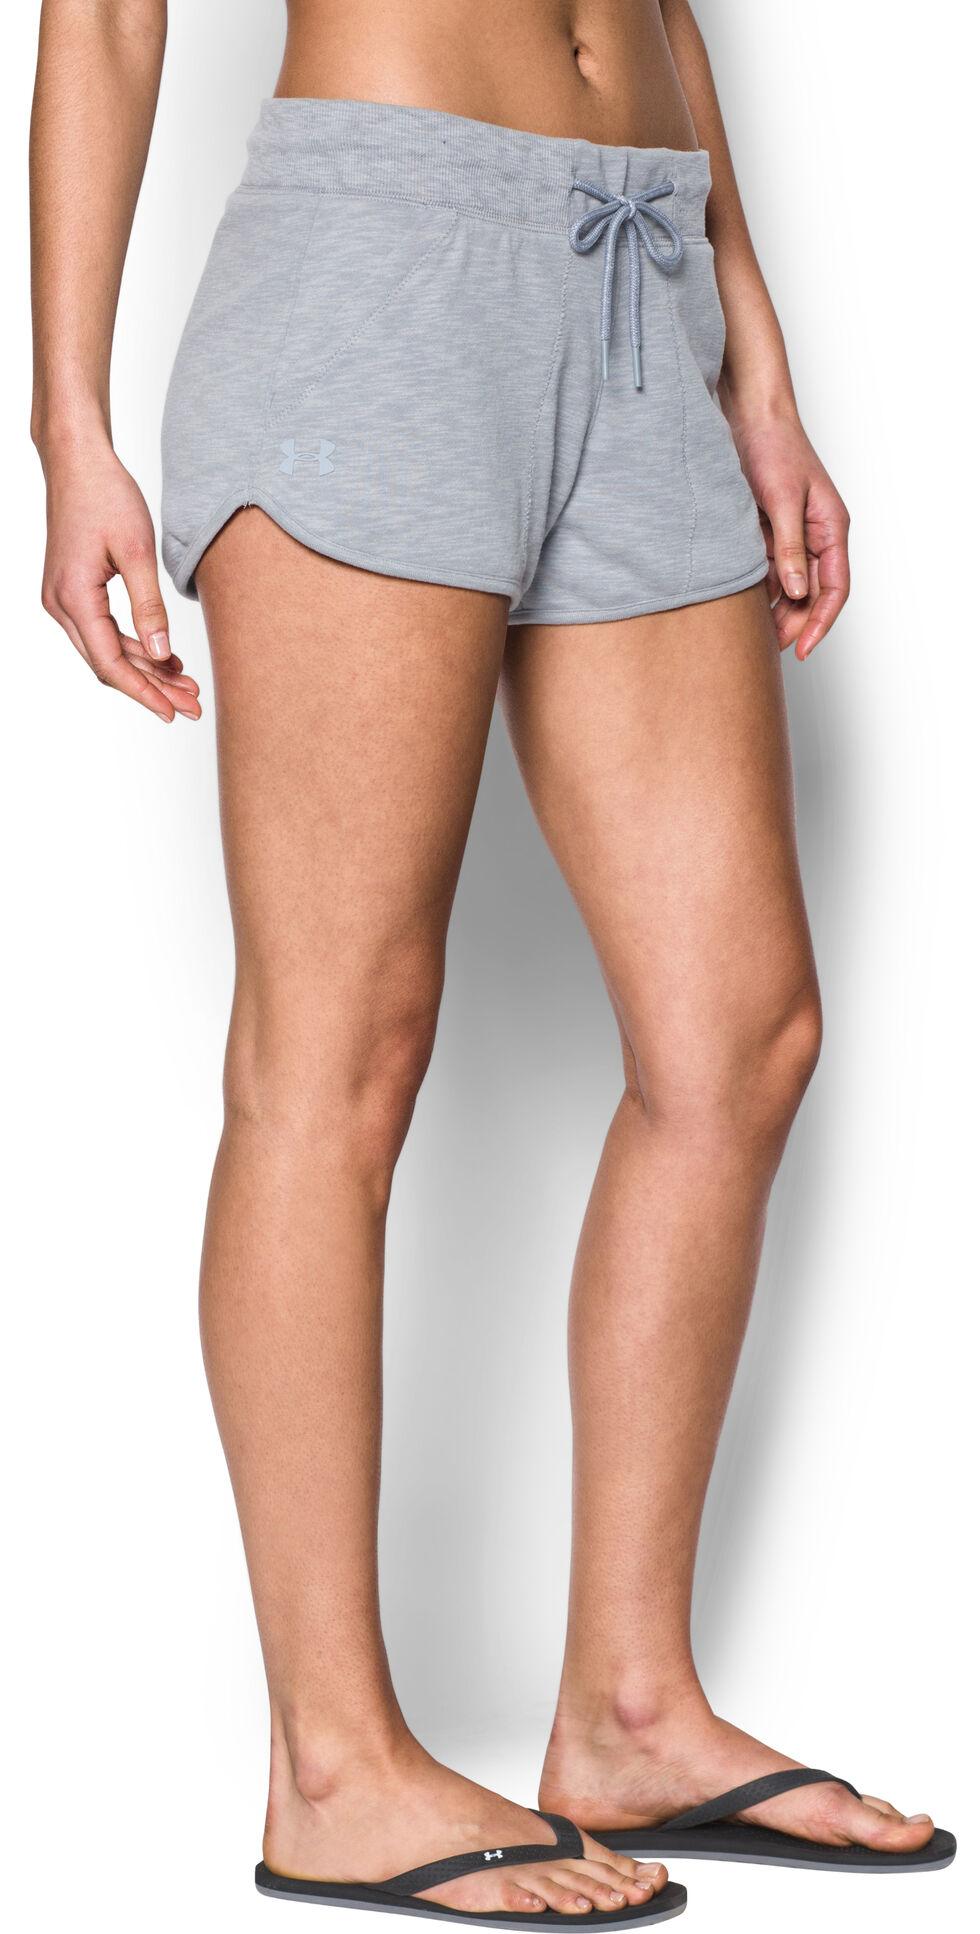 Under Armour Women's Grey Ocean Shoreline Terry Shorts, Grey, hi-res